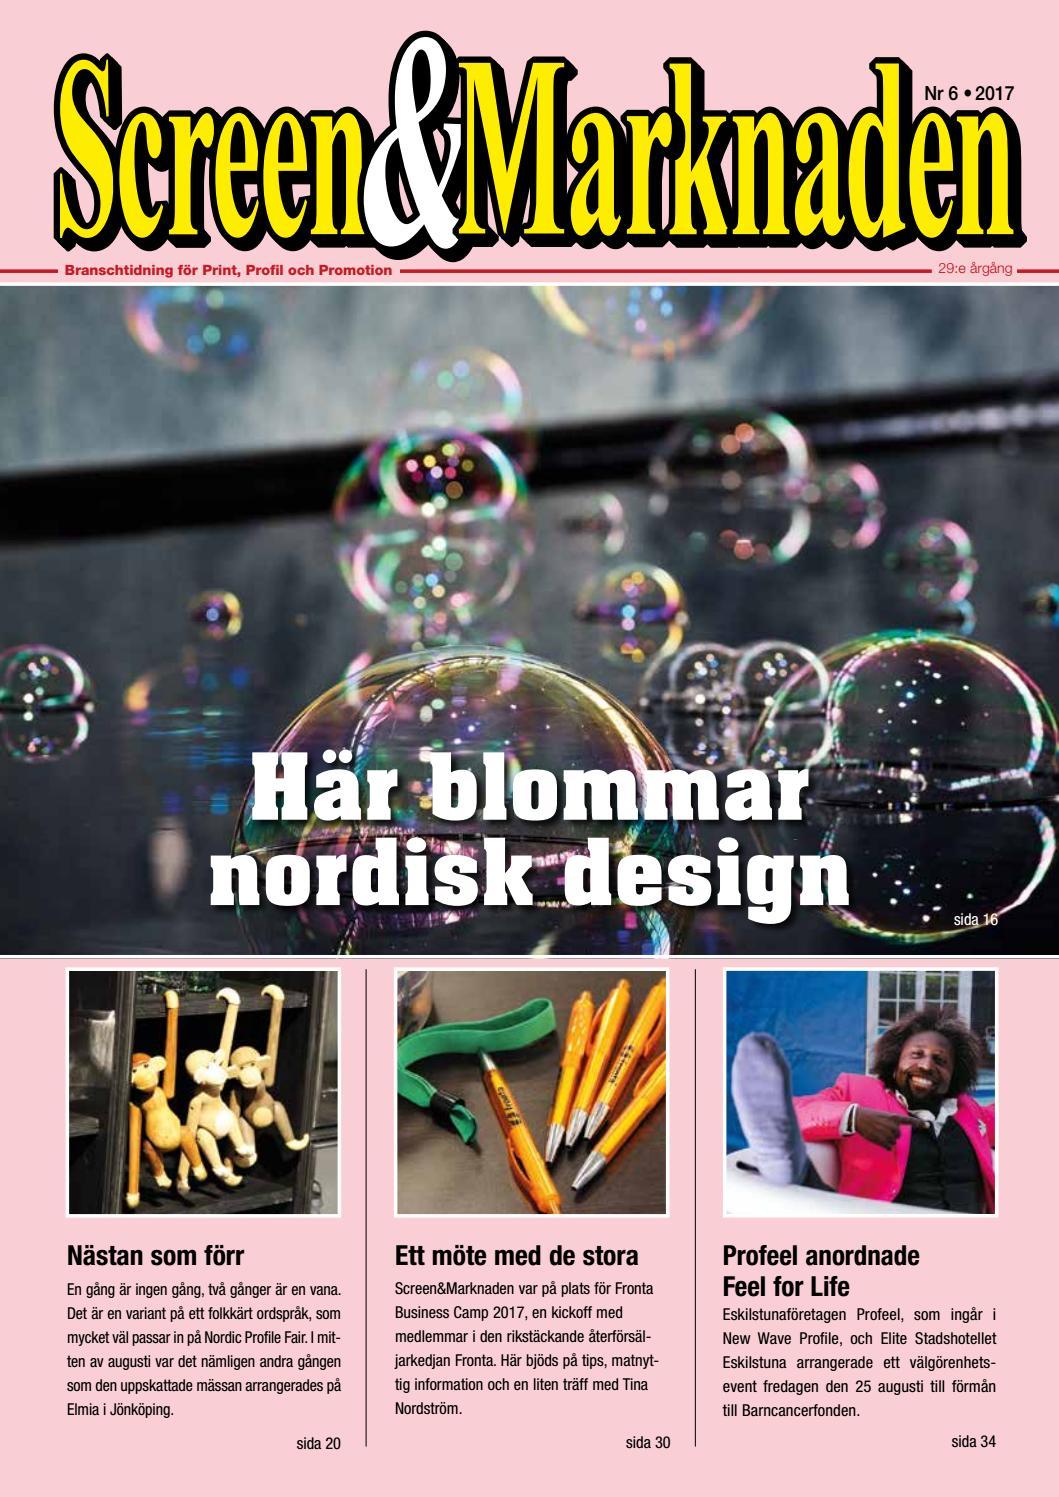 Screen marknaden 6 2017 by Martin Eriksson - issuu b60f0f9314d98